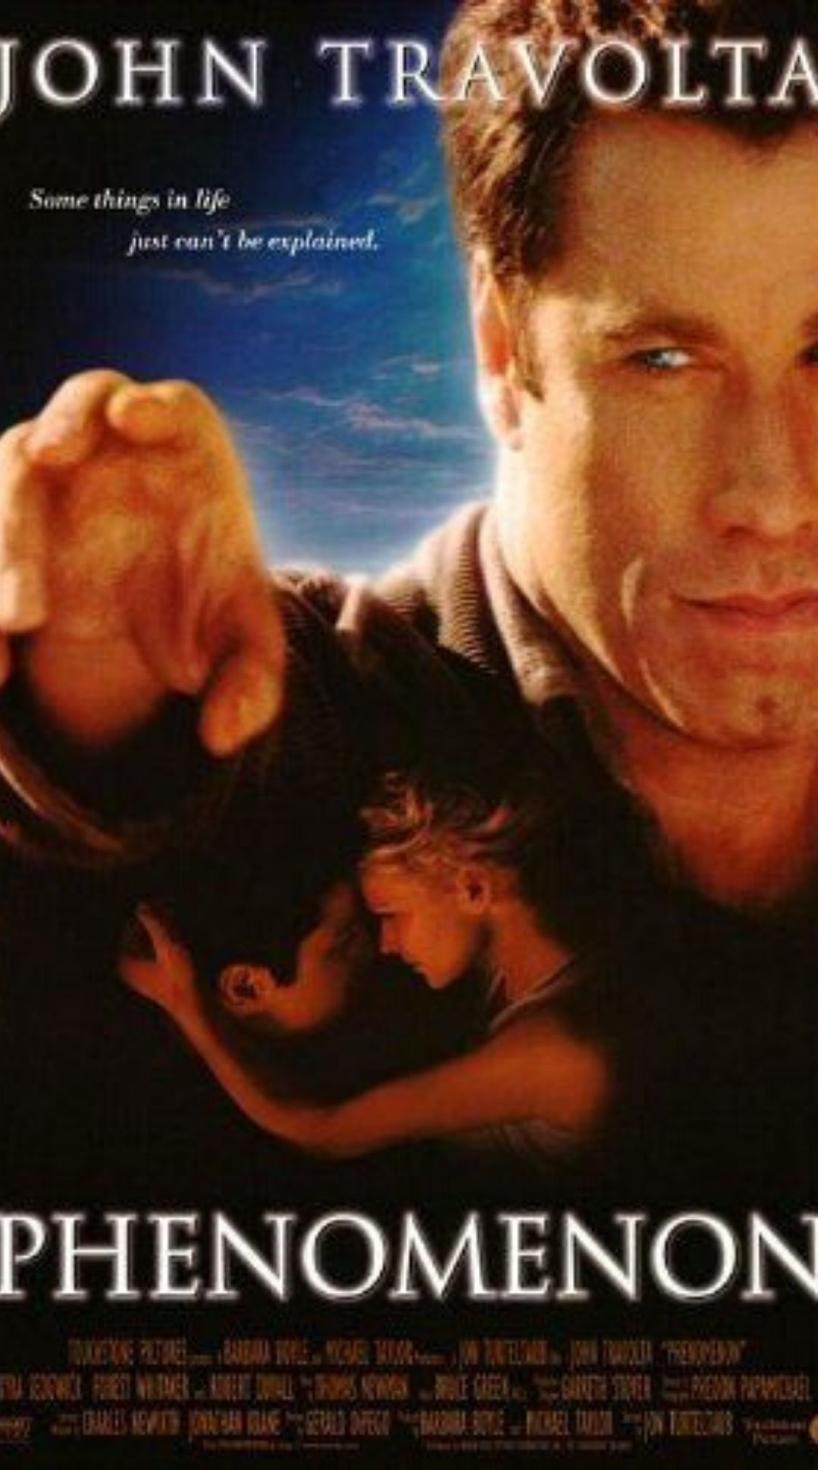 Best 90's Movies, Forgotten 90's movies, Watch 90's movies, 80 movies from the 90's, Best Movies, Movies, 90's Movies